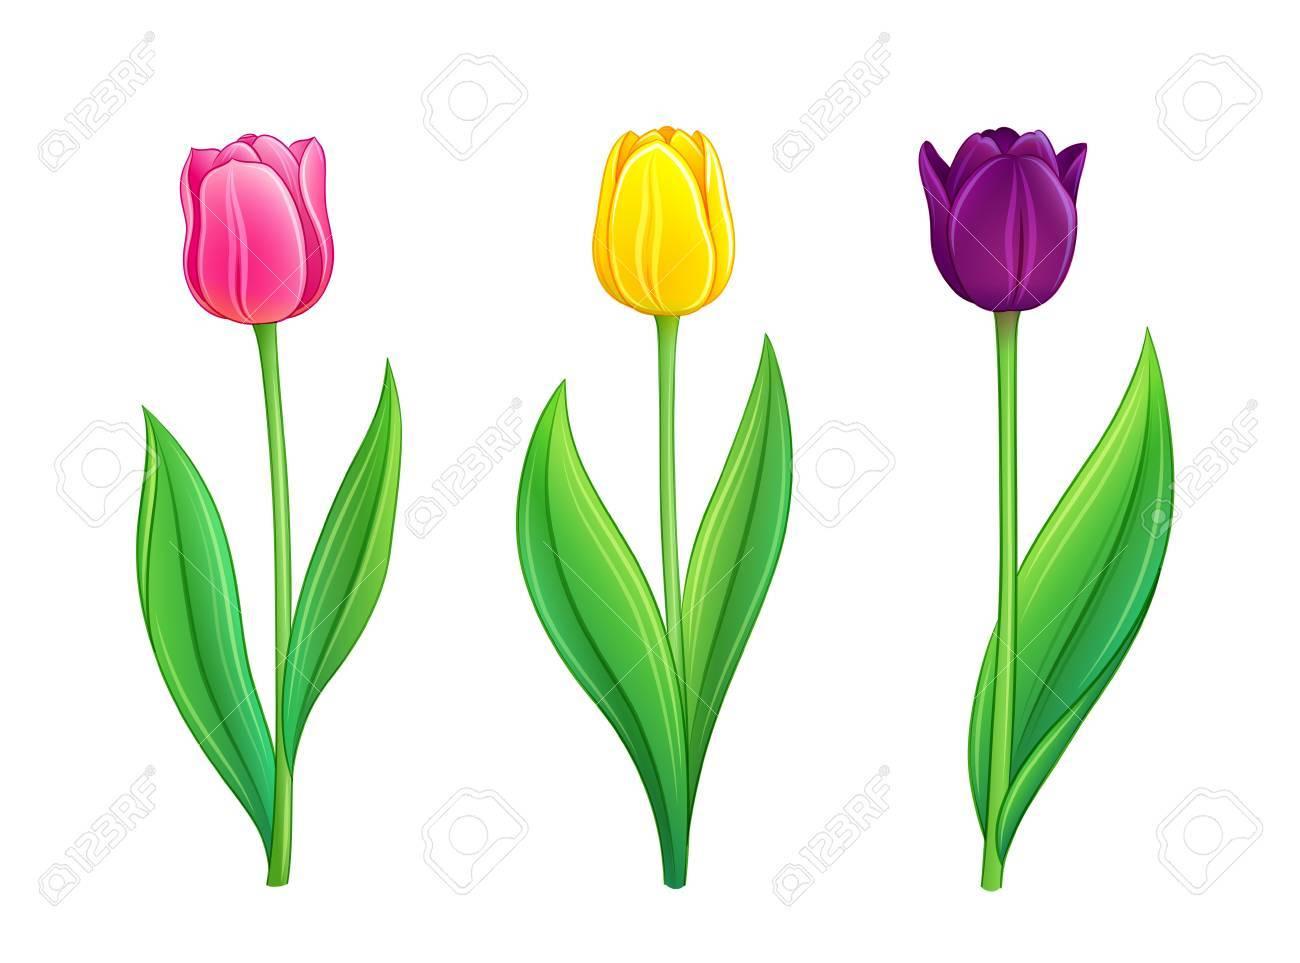 Set of tulips. Vector illustration in eps10 format Stock Vector - 18248339